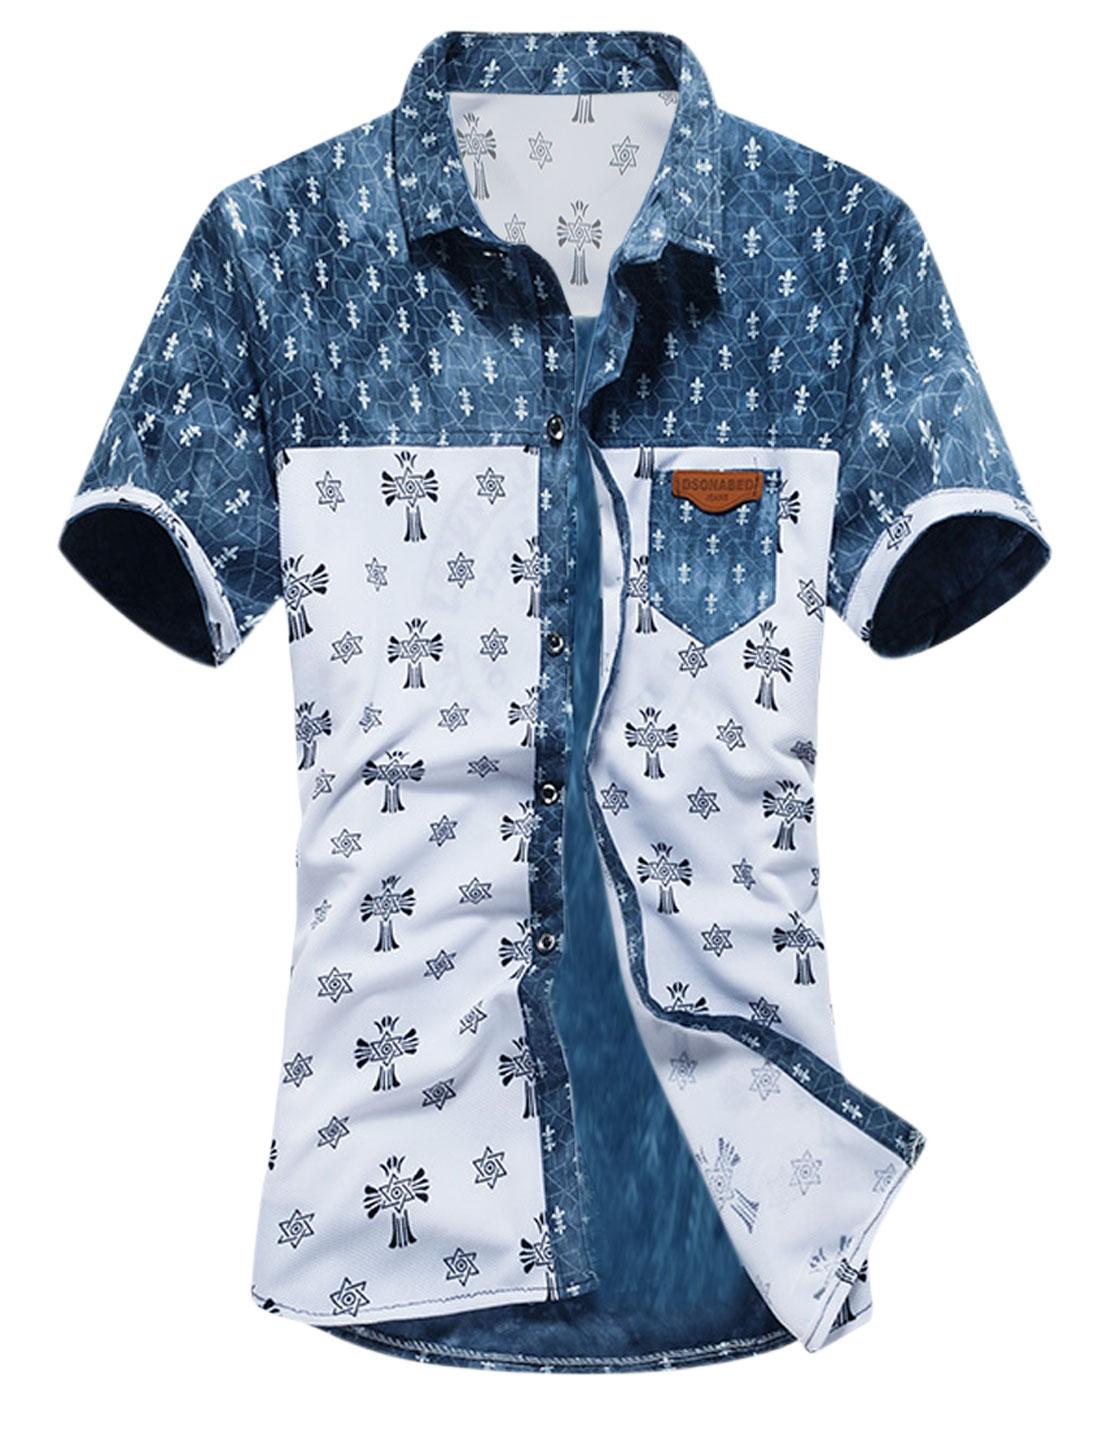 Men Short Sleeve Button Up Novelty Prints Casual Shirt White Navy Blue S